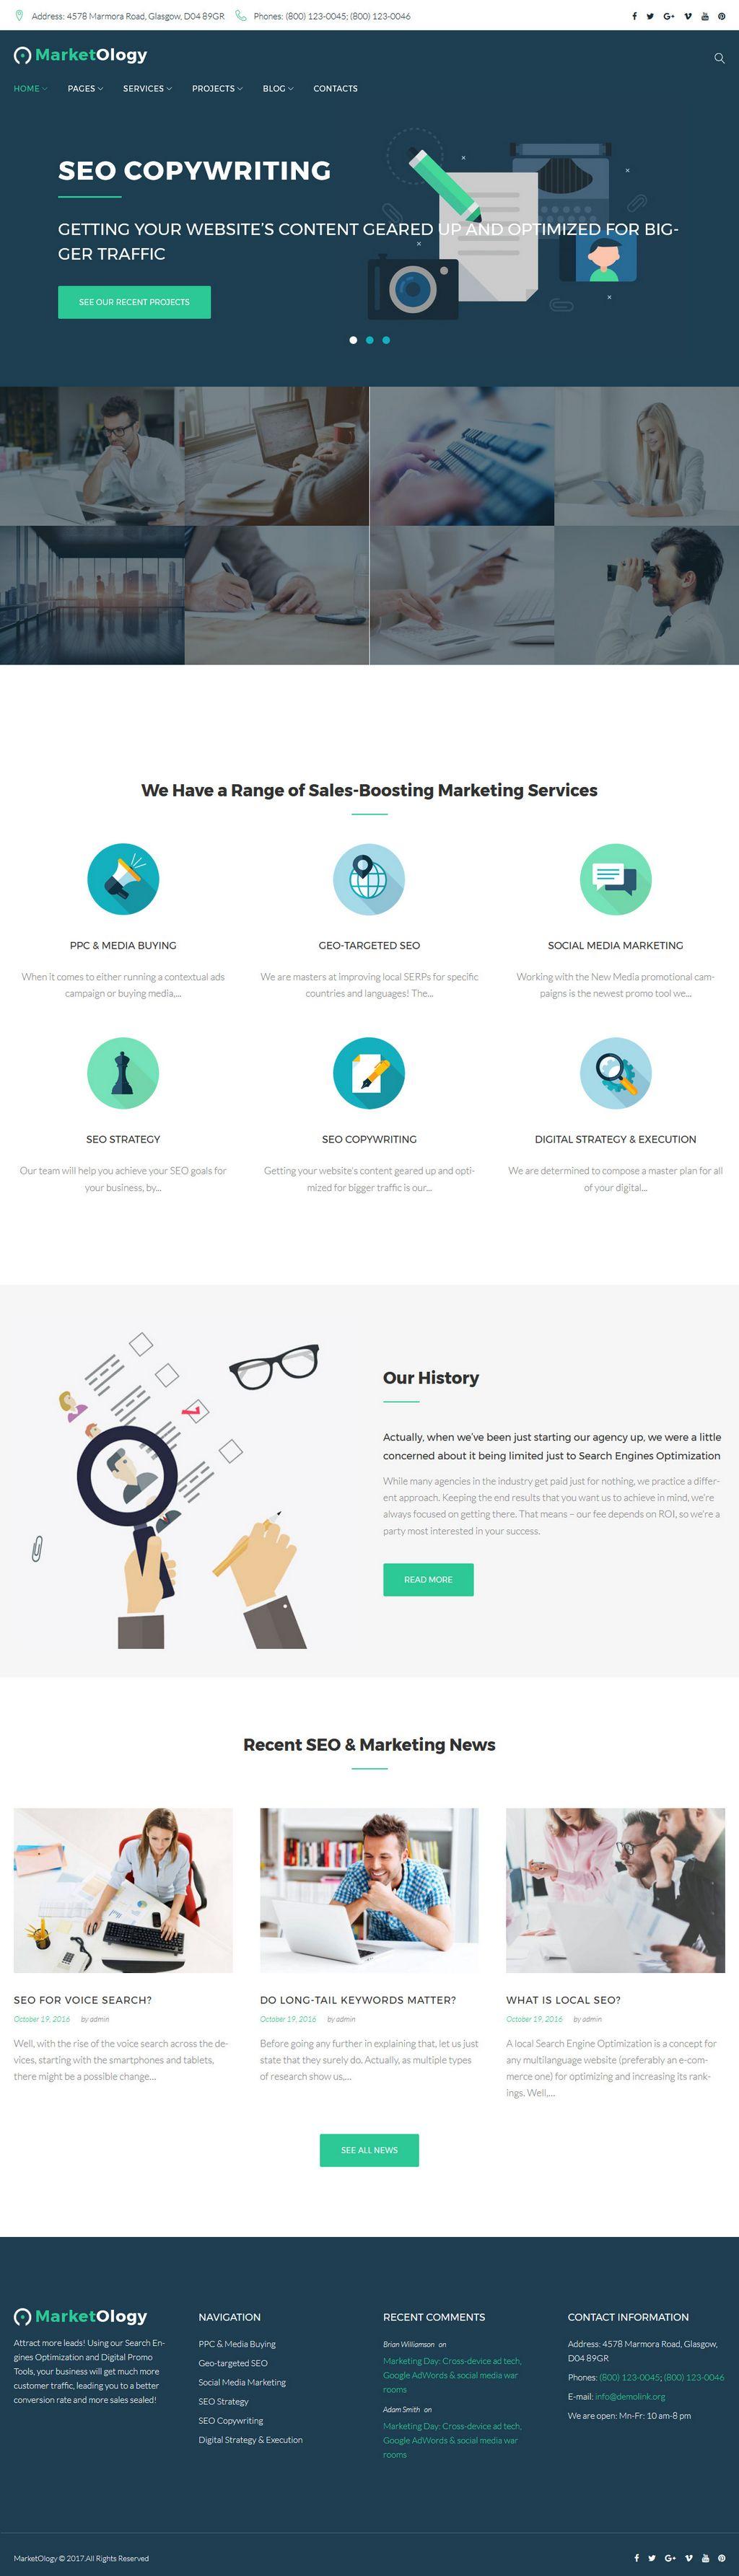 marketology templatemonster–wordpress theme 01 - marketology-templatemonster–wordpress-theme-01